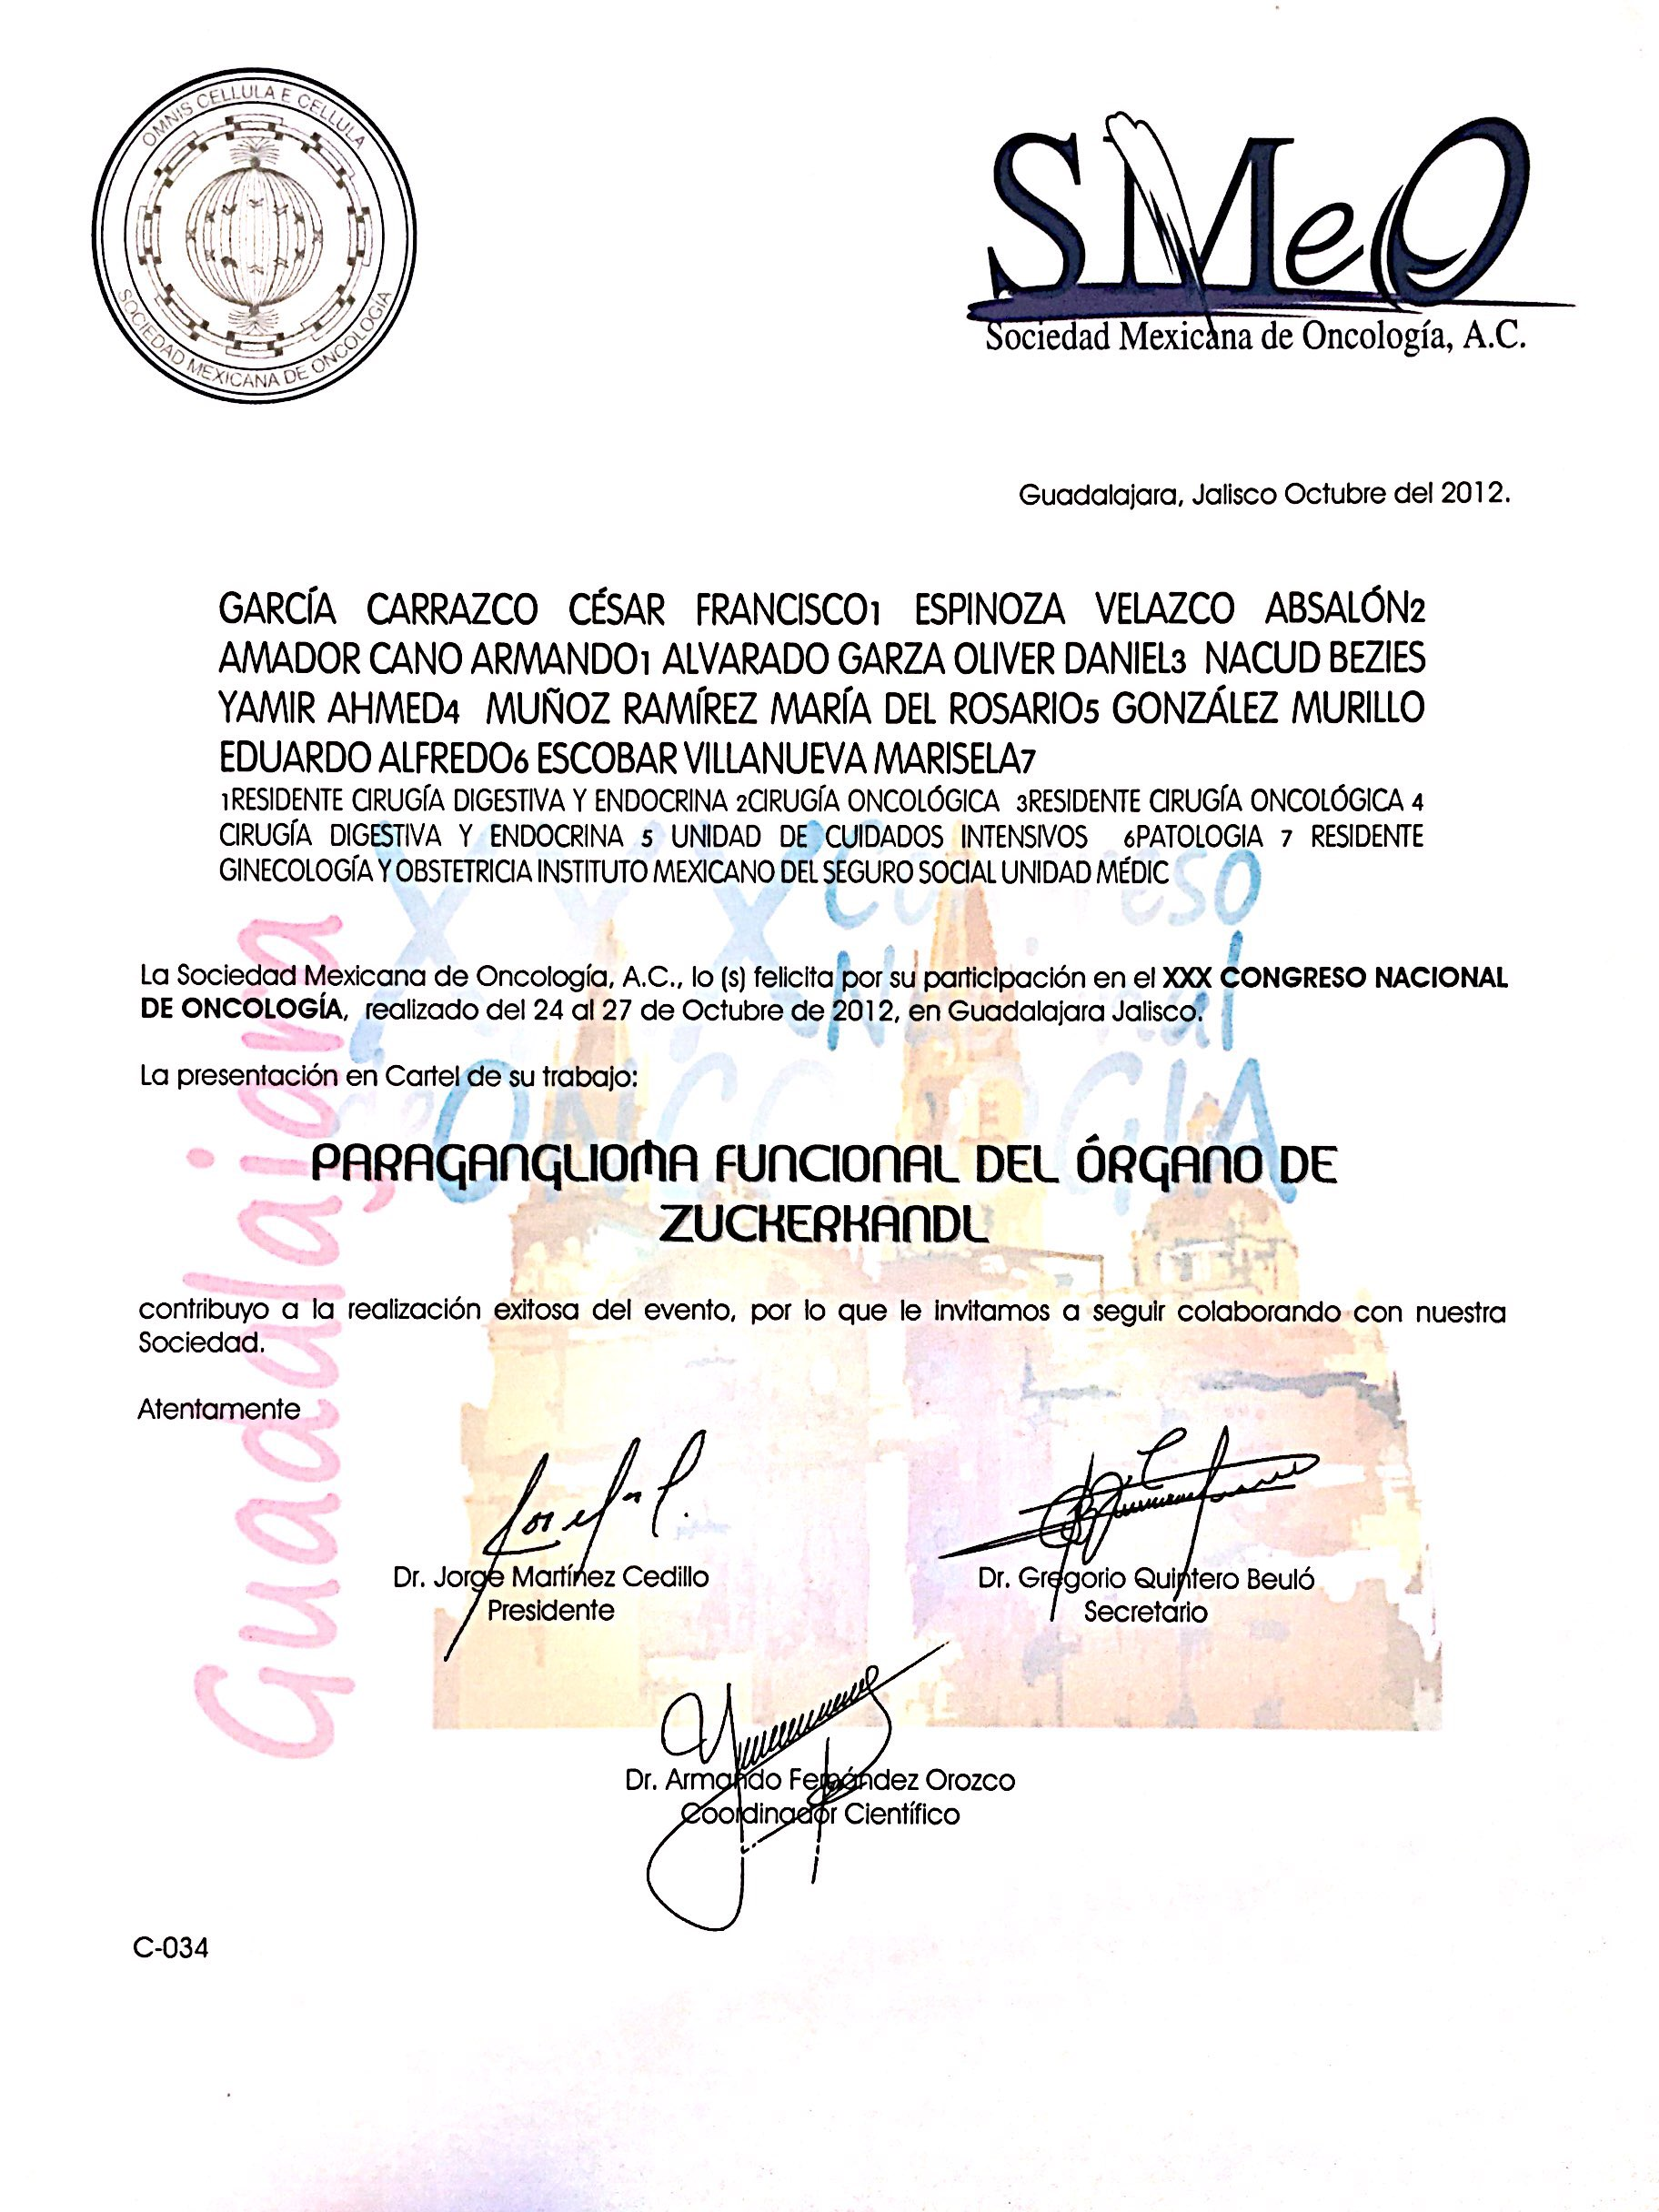 Nuevo doc 2018-02-20 11.21.39_25